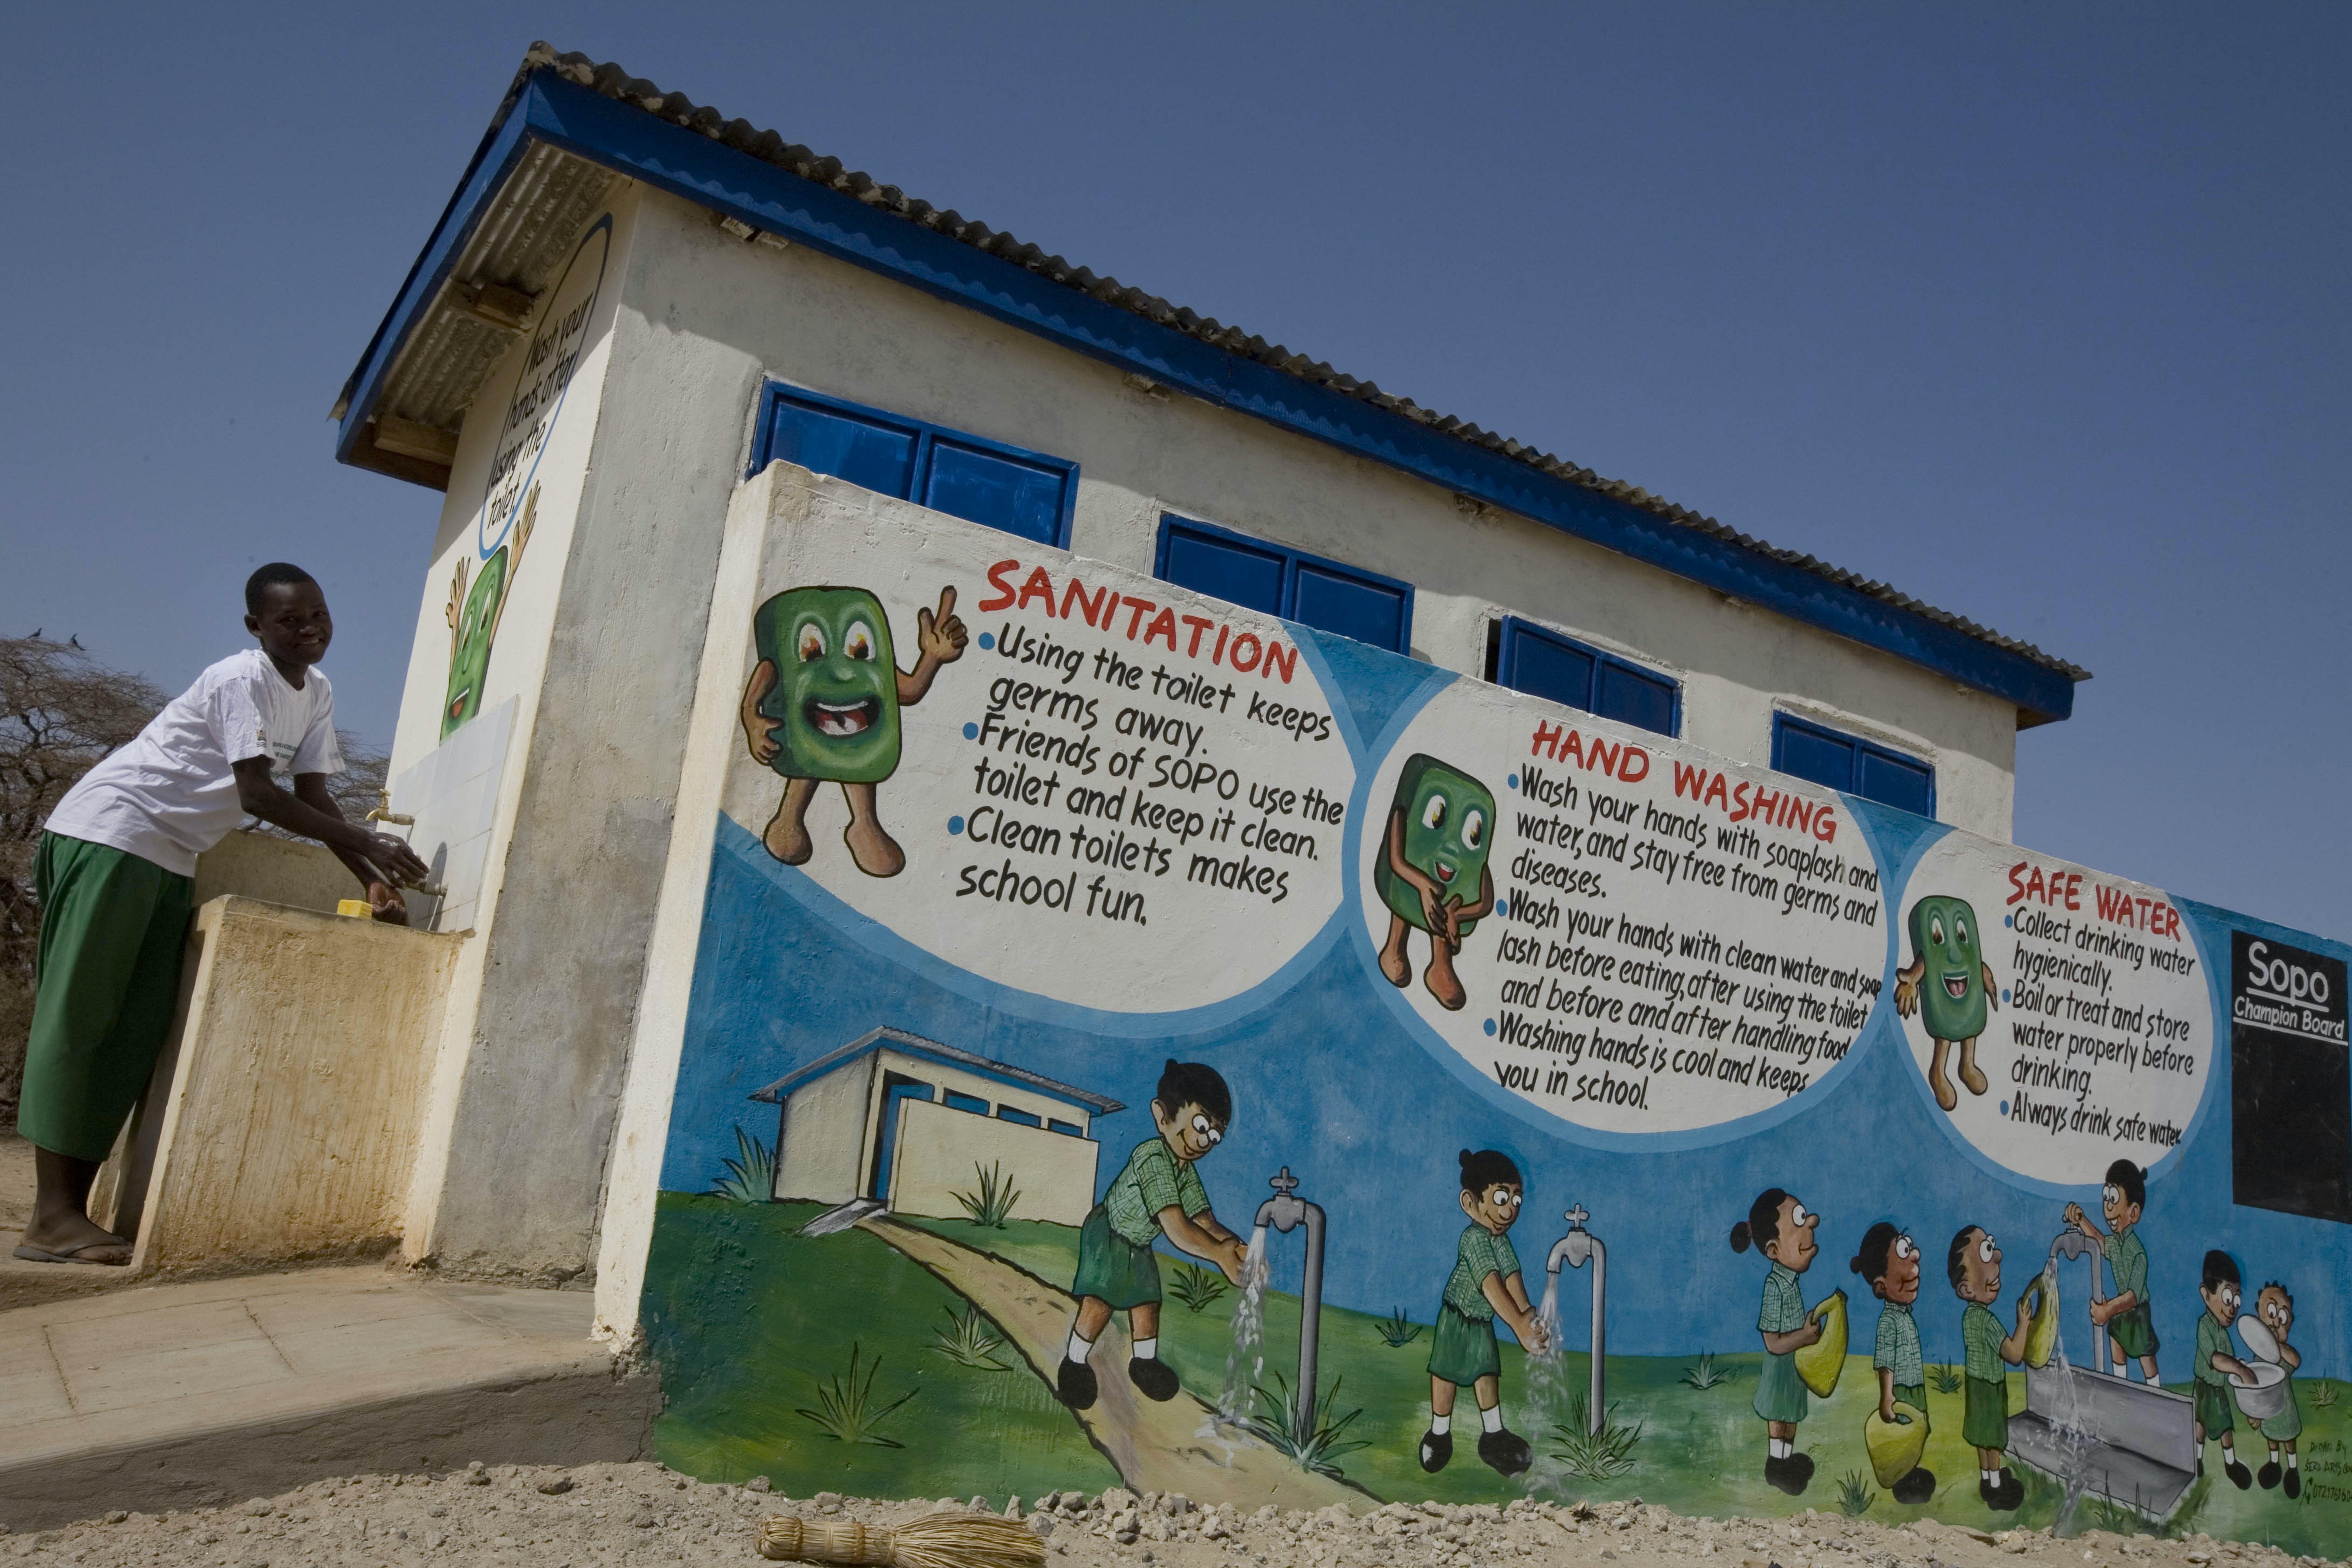 © UNICEF/NYHQ2011-1120/Holt